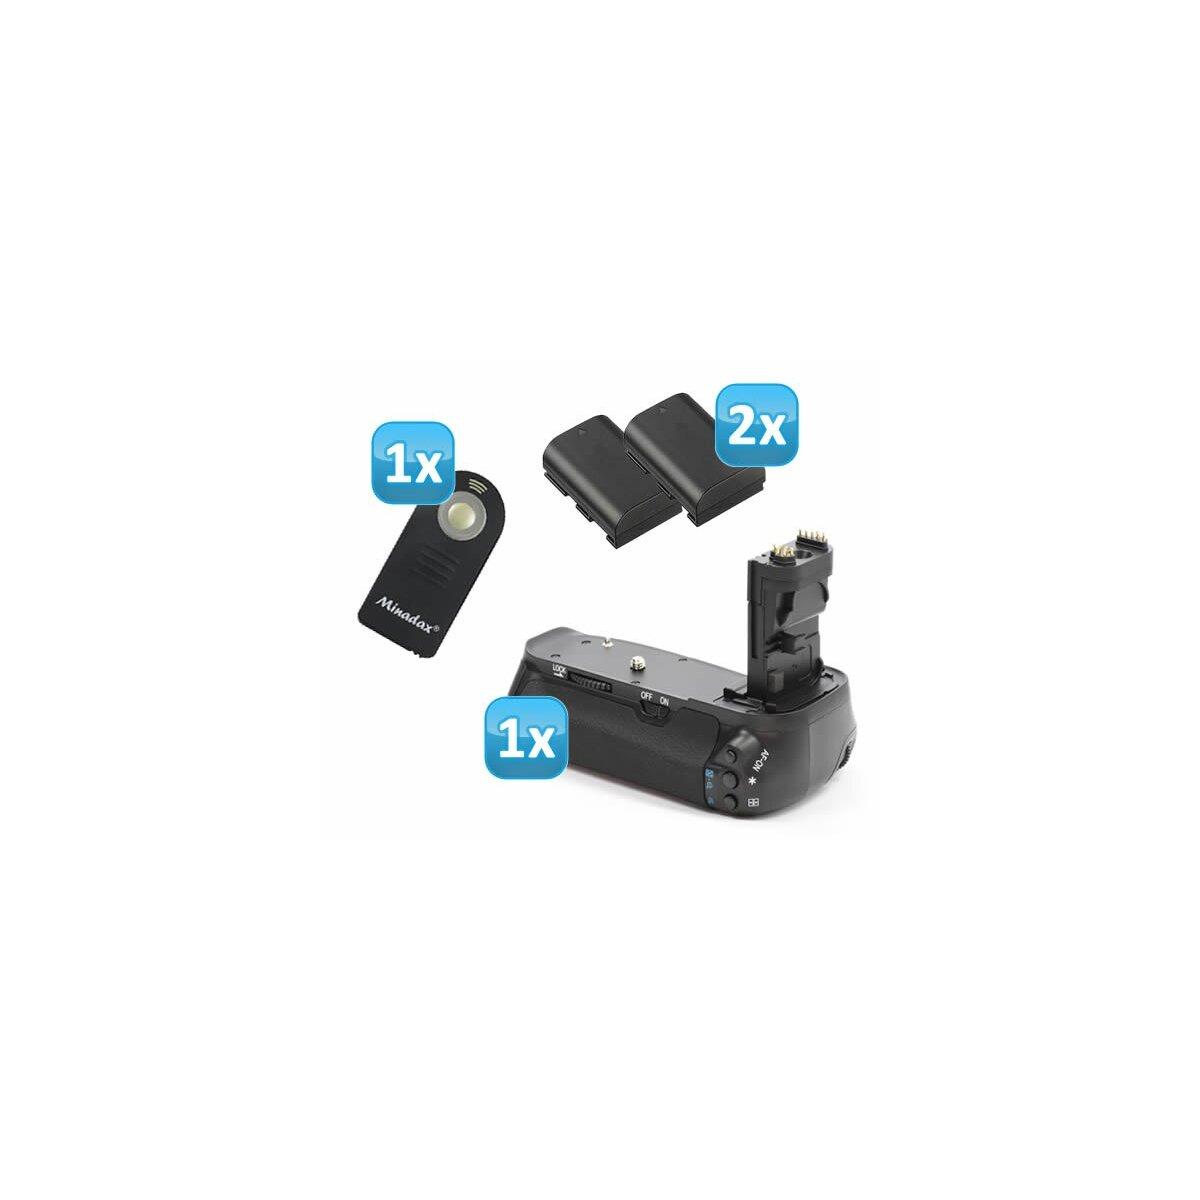 Minadax Profi Batteriegriff kompatibel mit Canon EOS 60D Ersatz für BG-E9 - für 2x LP-E6 und 6x AA Batterien + 2x LP-E6 Nachbau-Akkus + 1x Infrarot Fernbedienung!